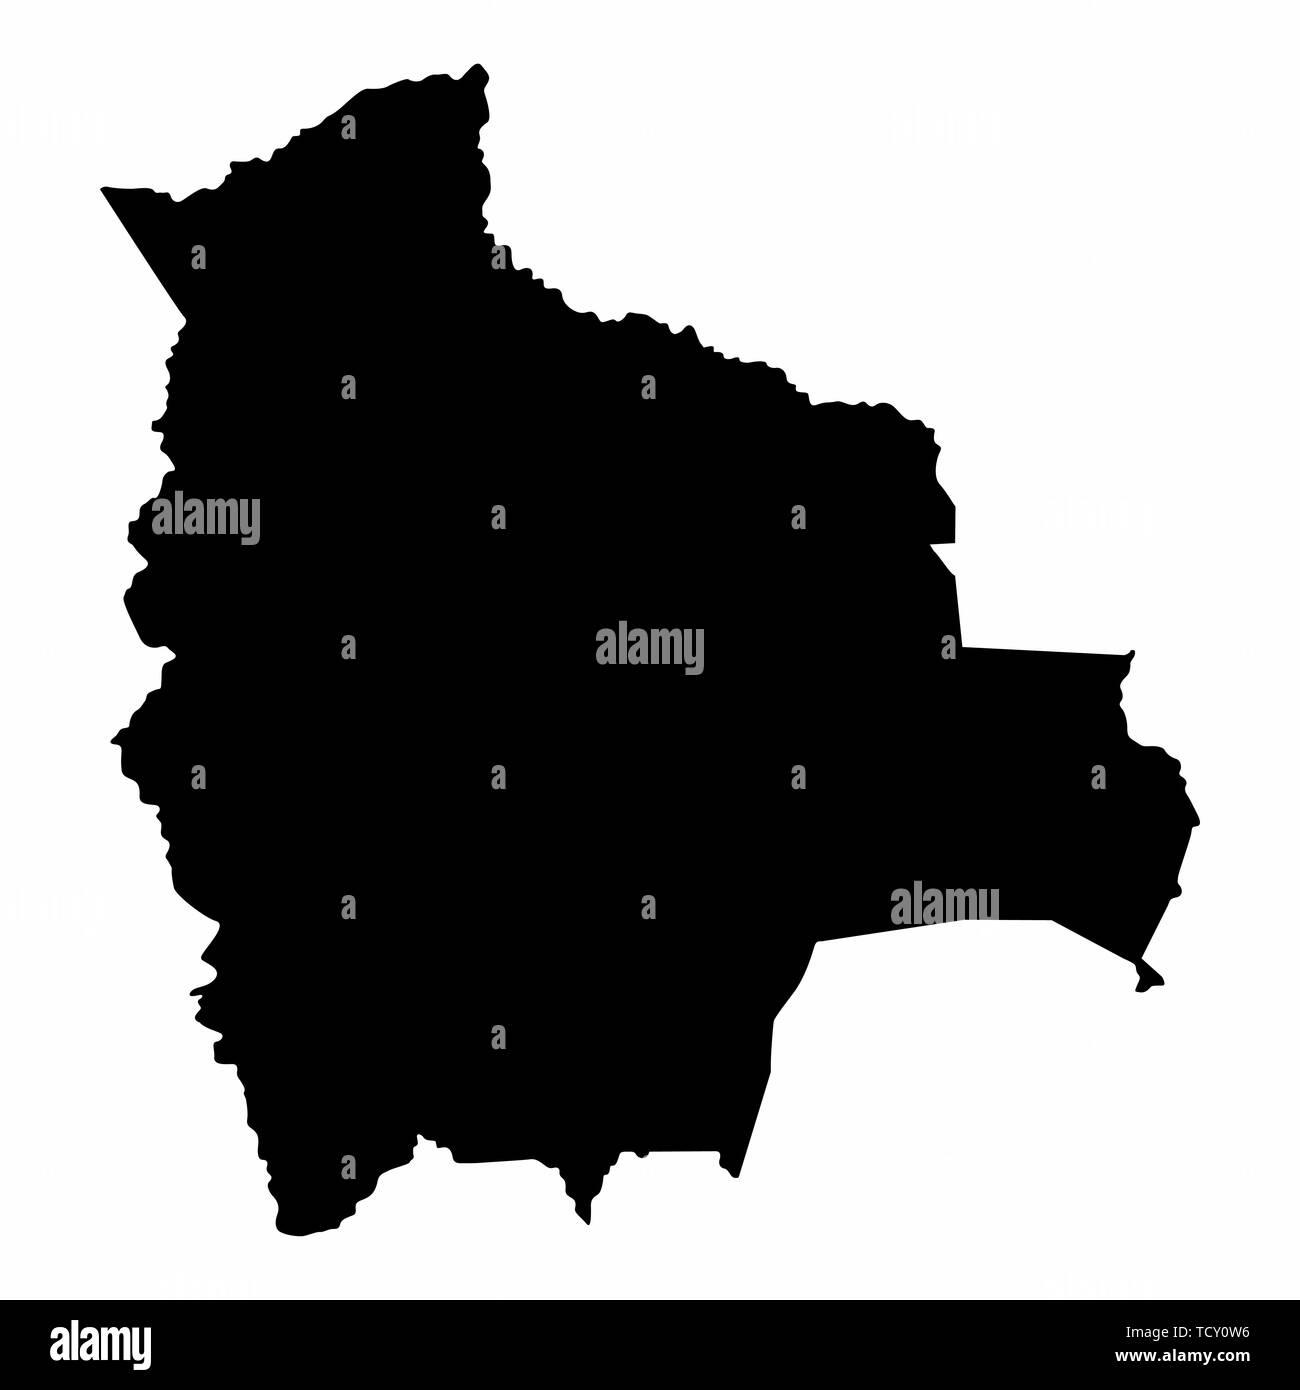 Bolivia map dark silhouette - Stock Image